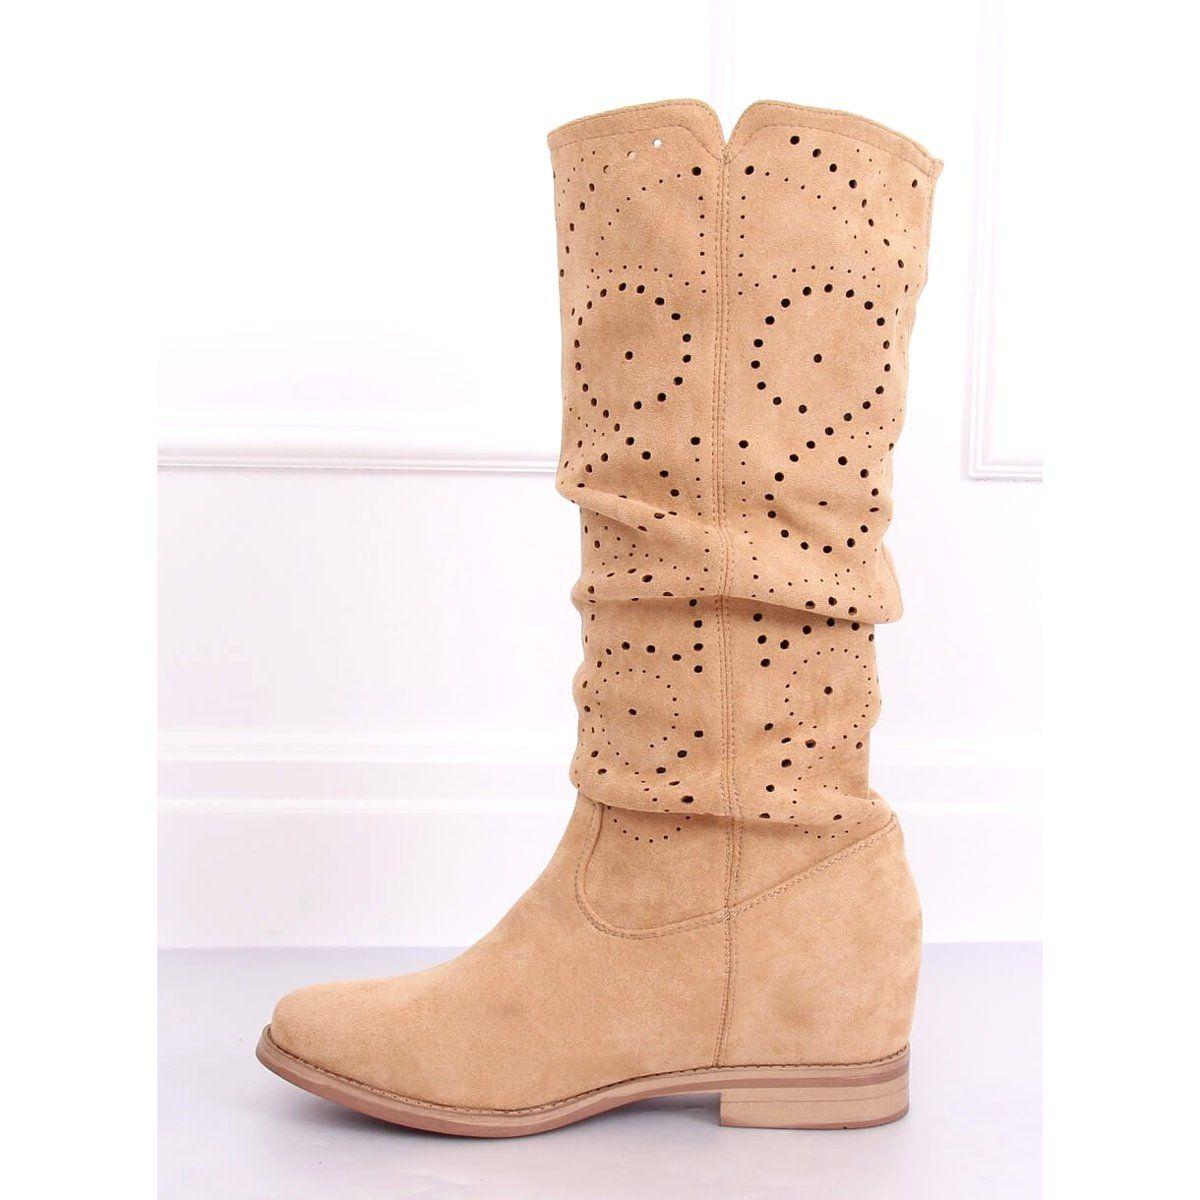 Kozaki Azurowe Na Koturnie Bezowe Nc1015 Beige Bezowy Boots Wedge Boot Shoes